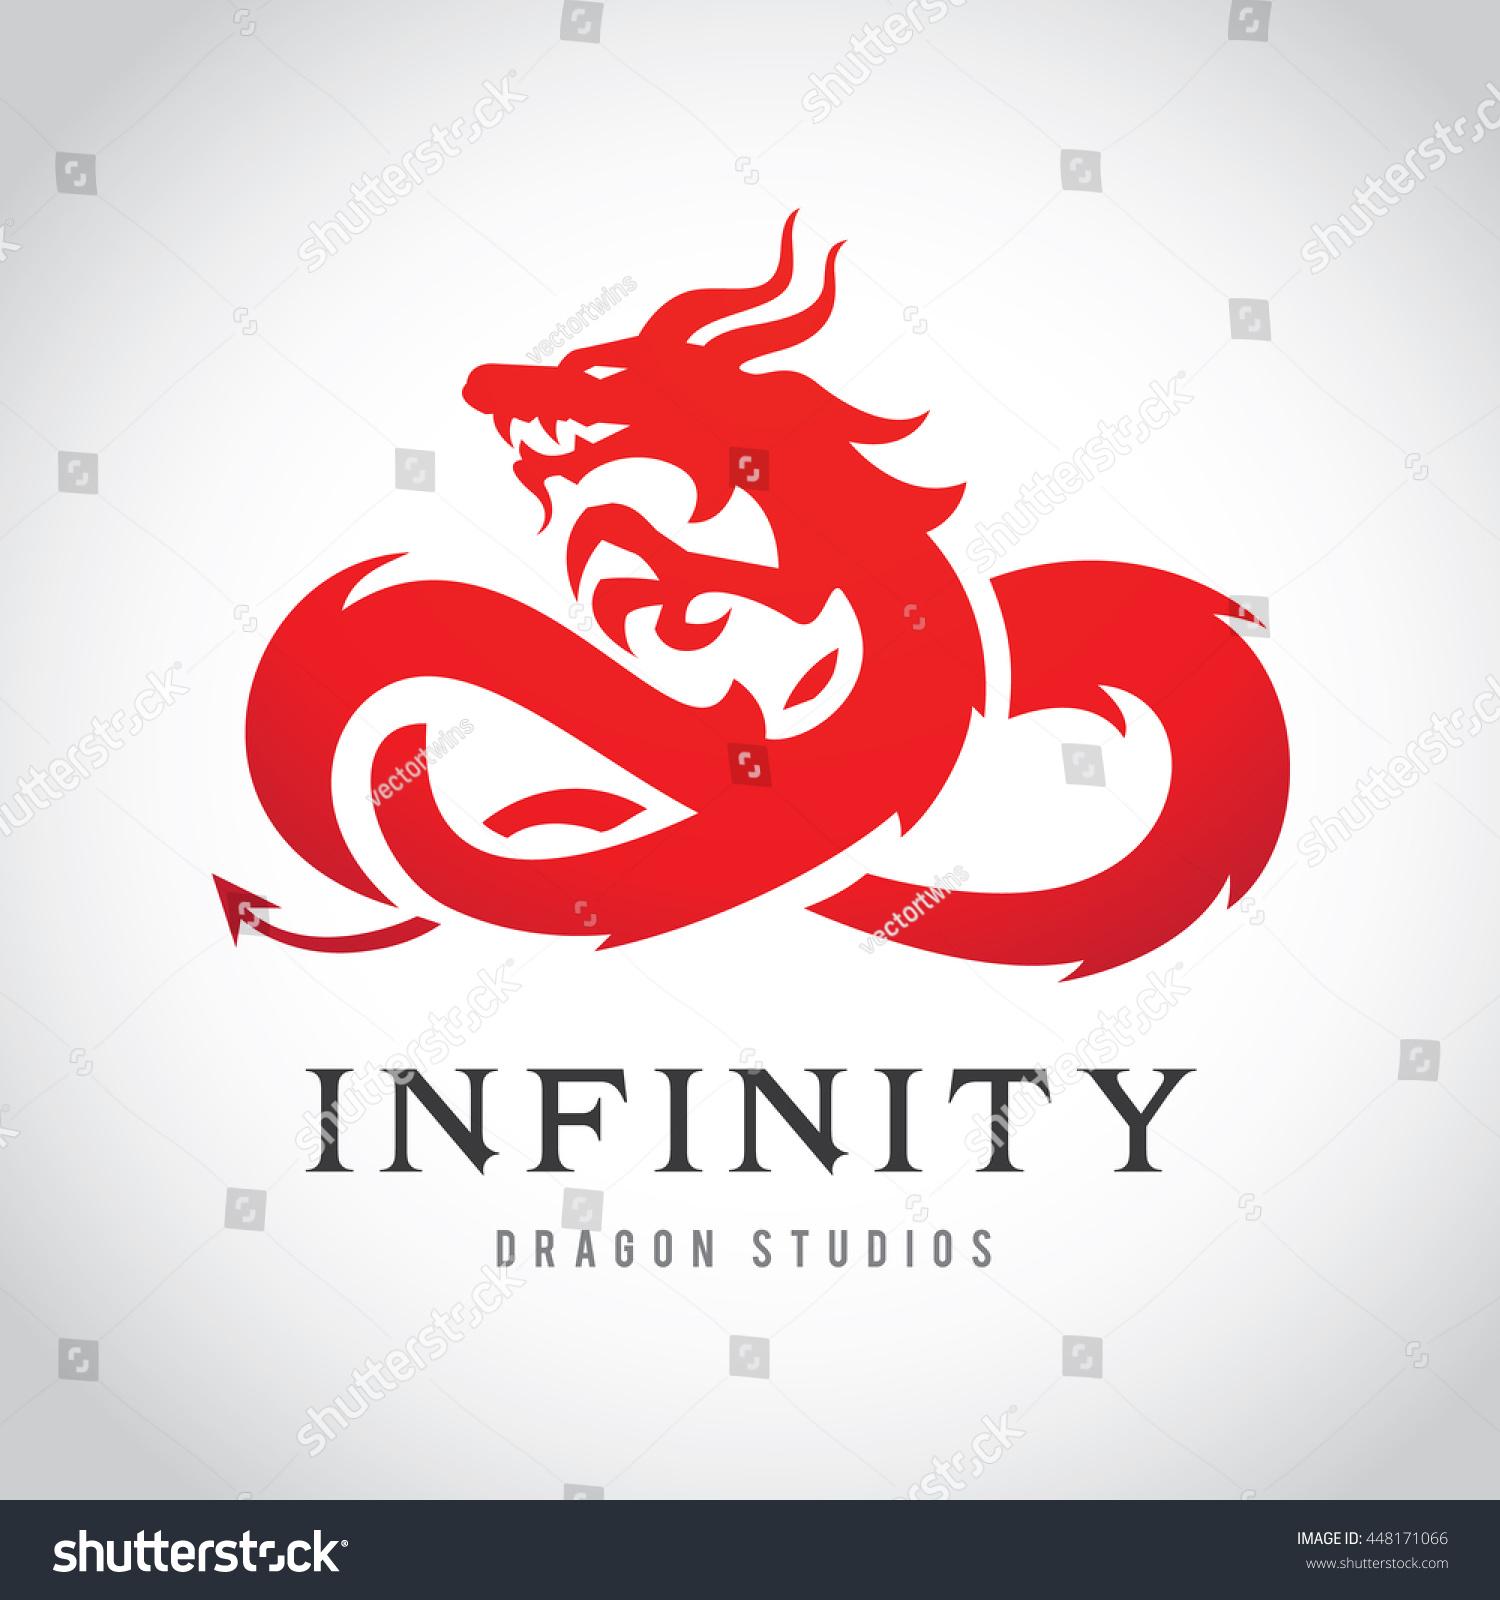 royalty free dragon logo 448171066 stock photo avopix com